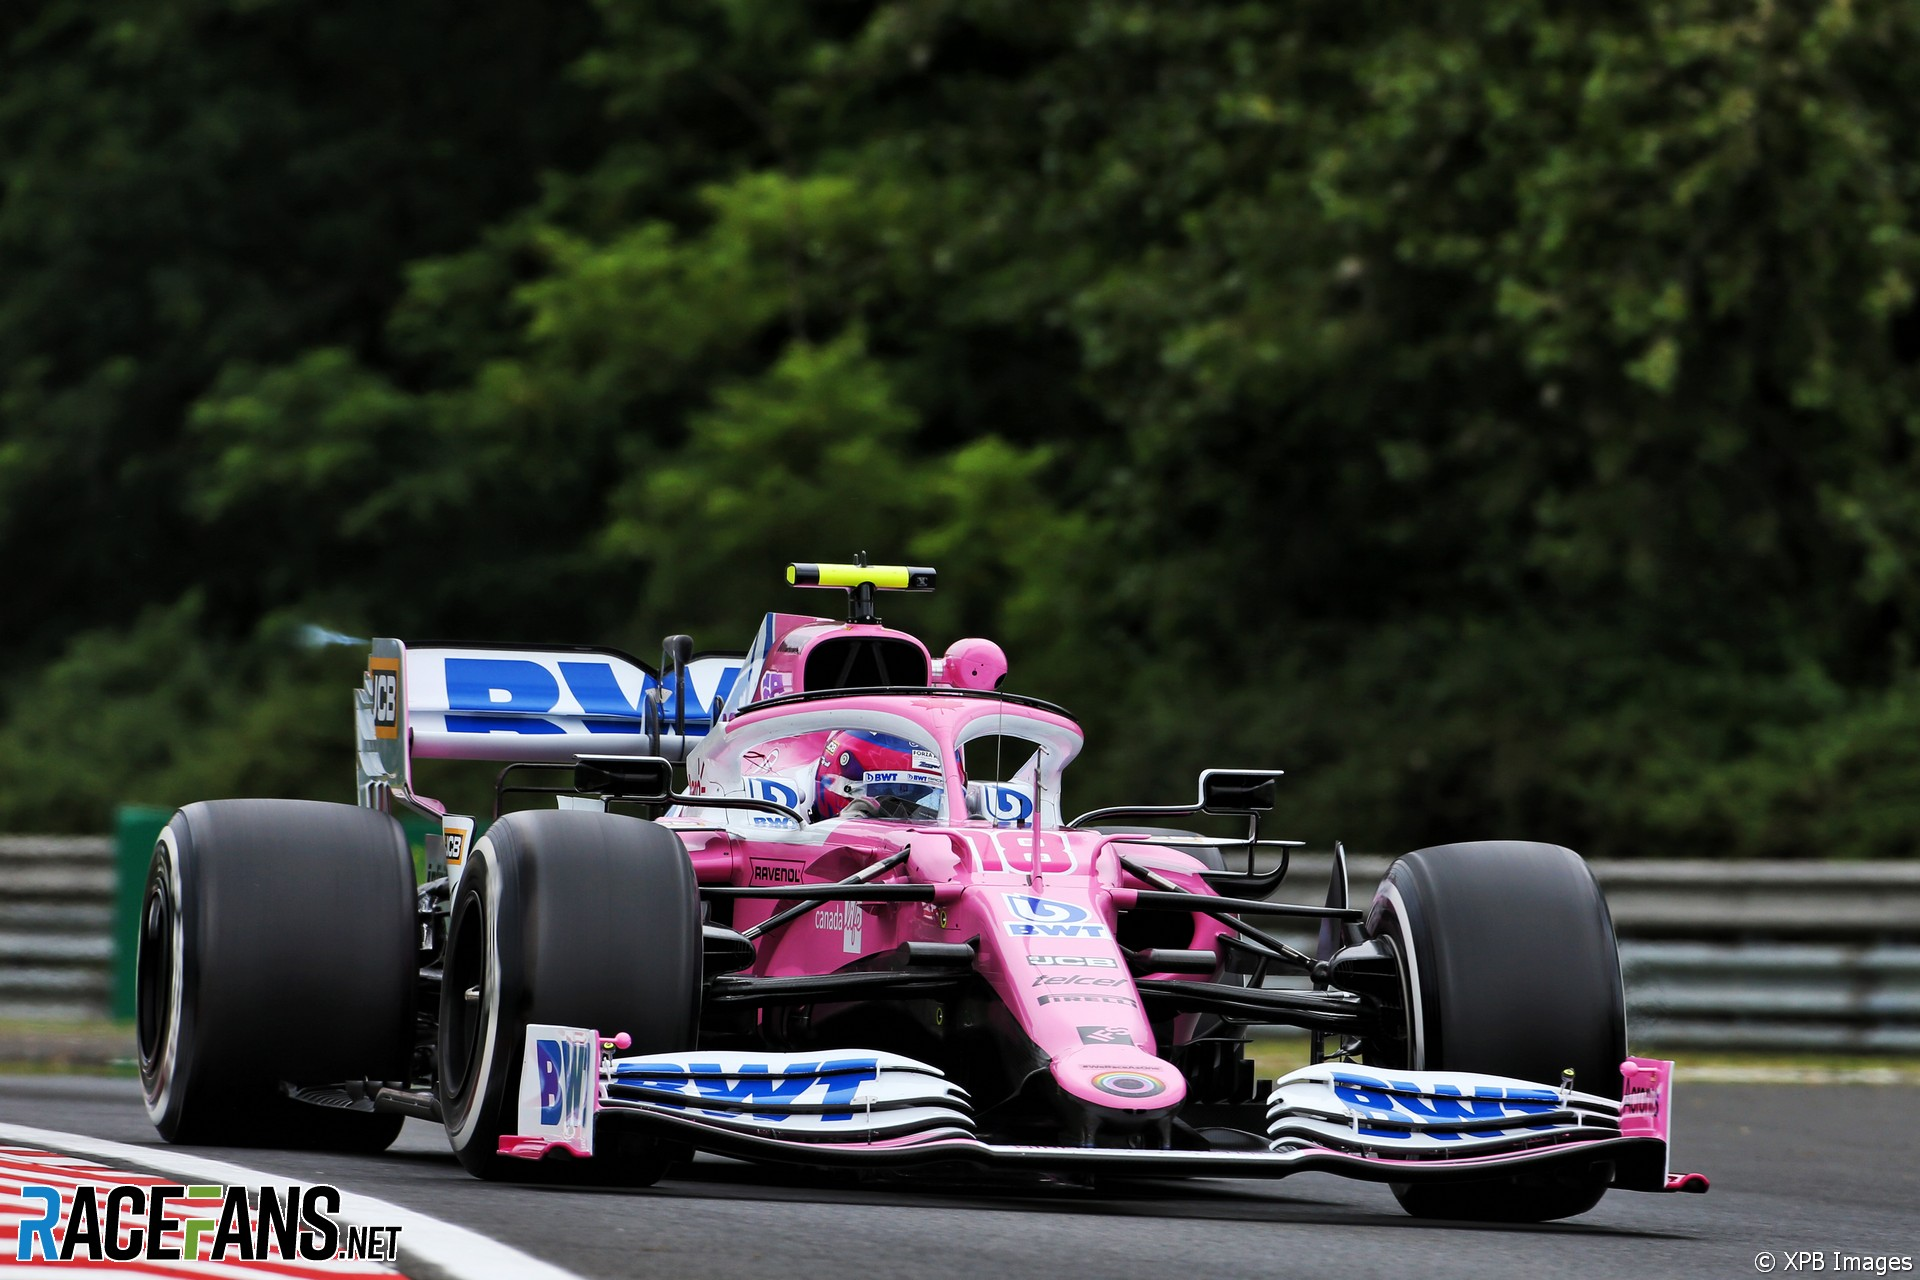 Lance Stroll, Racing Point, Hungaroring, 2020